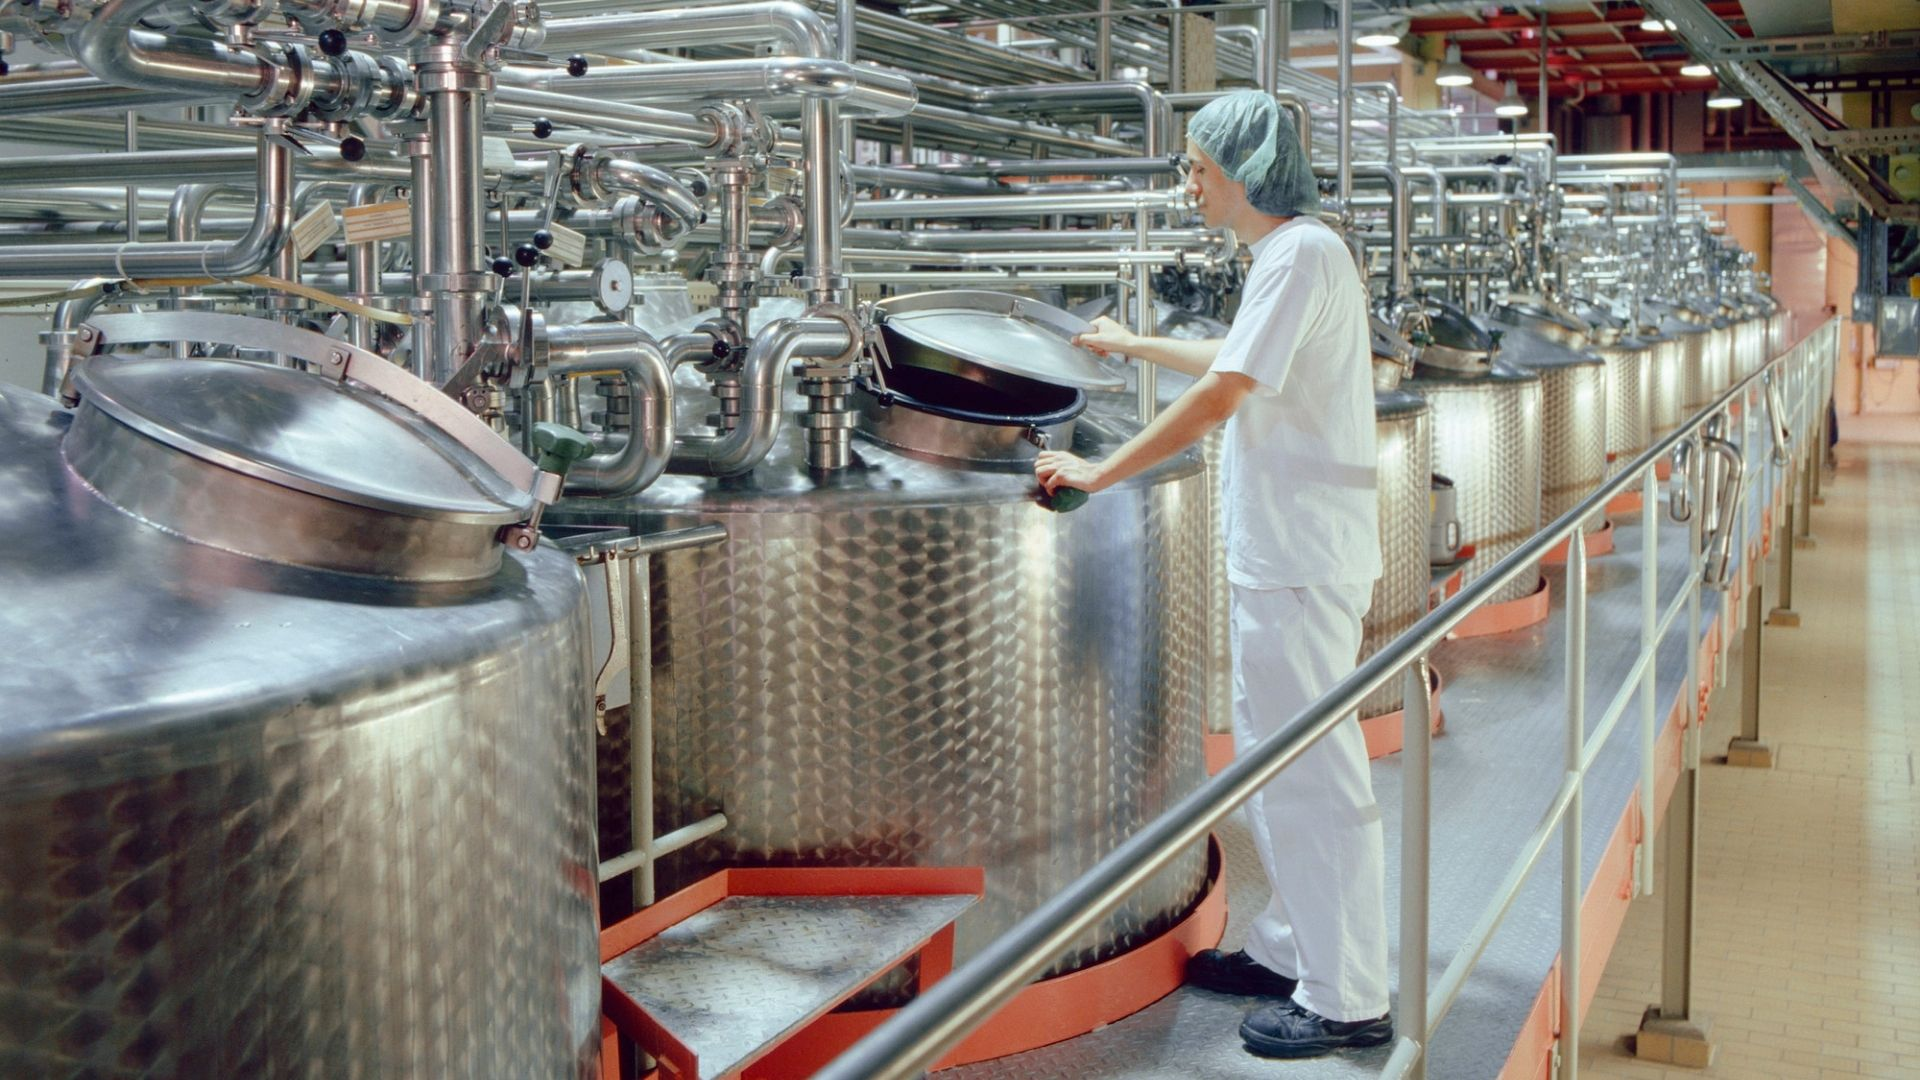 Production of Raw materials at Gelita